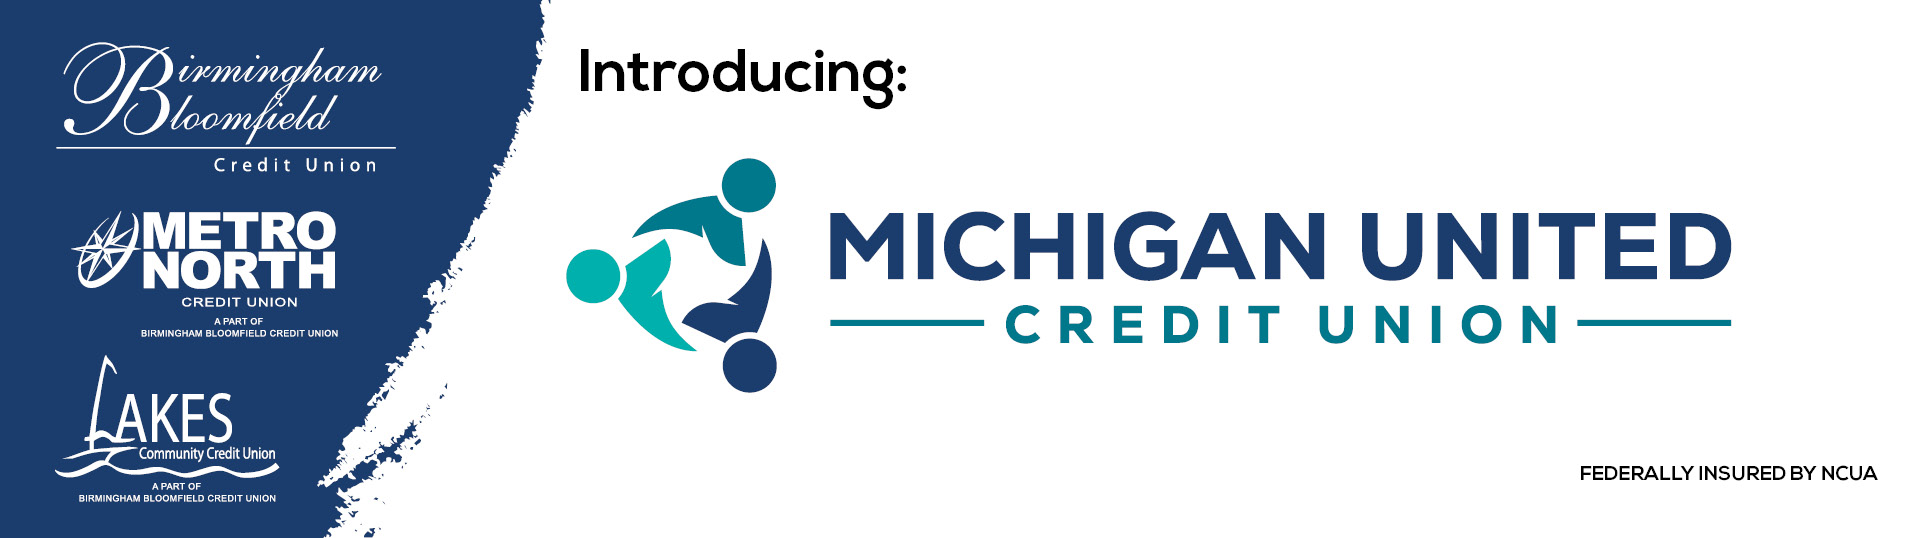 Introducing Michigan United Credit Union